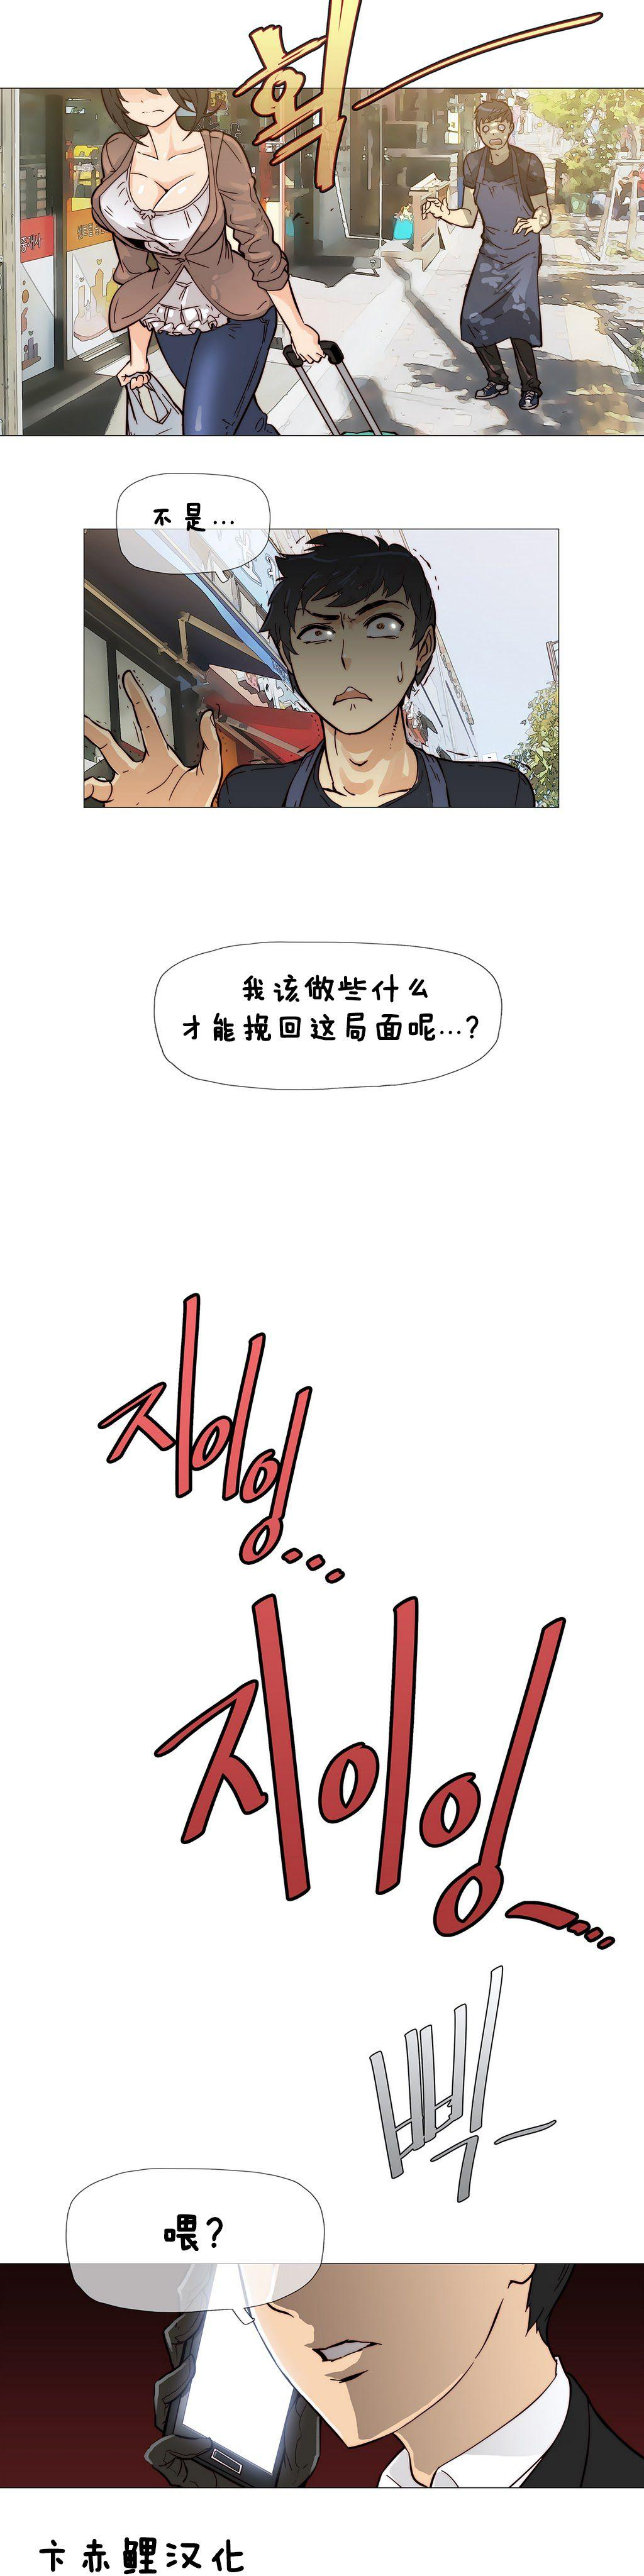 HouseHold Affairs 【卞赤鲤个人汉化】1~33话(持续更新中) 80